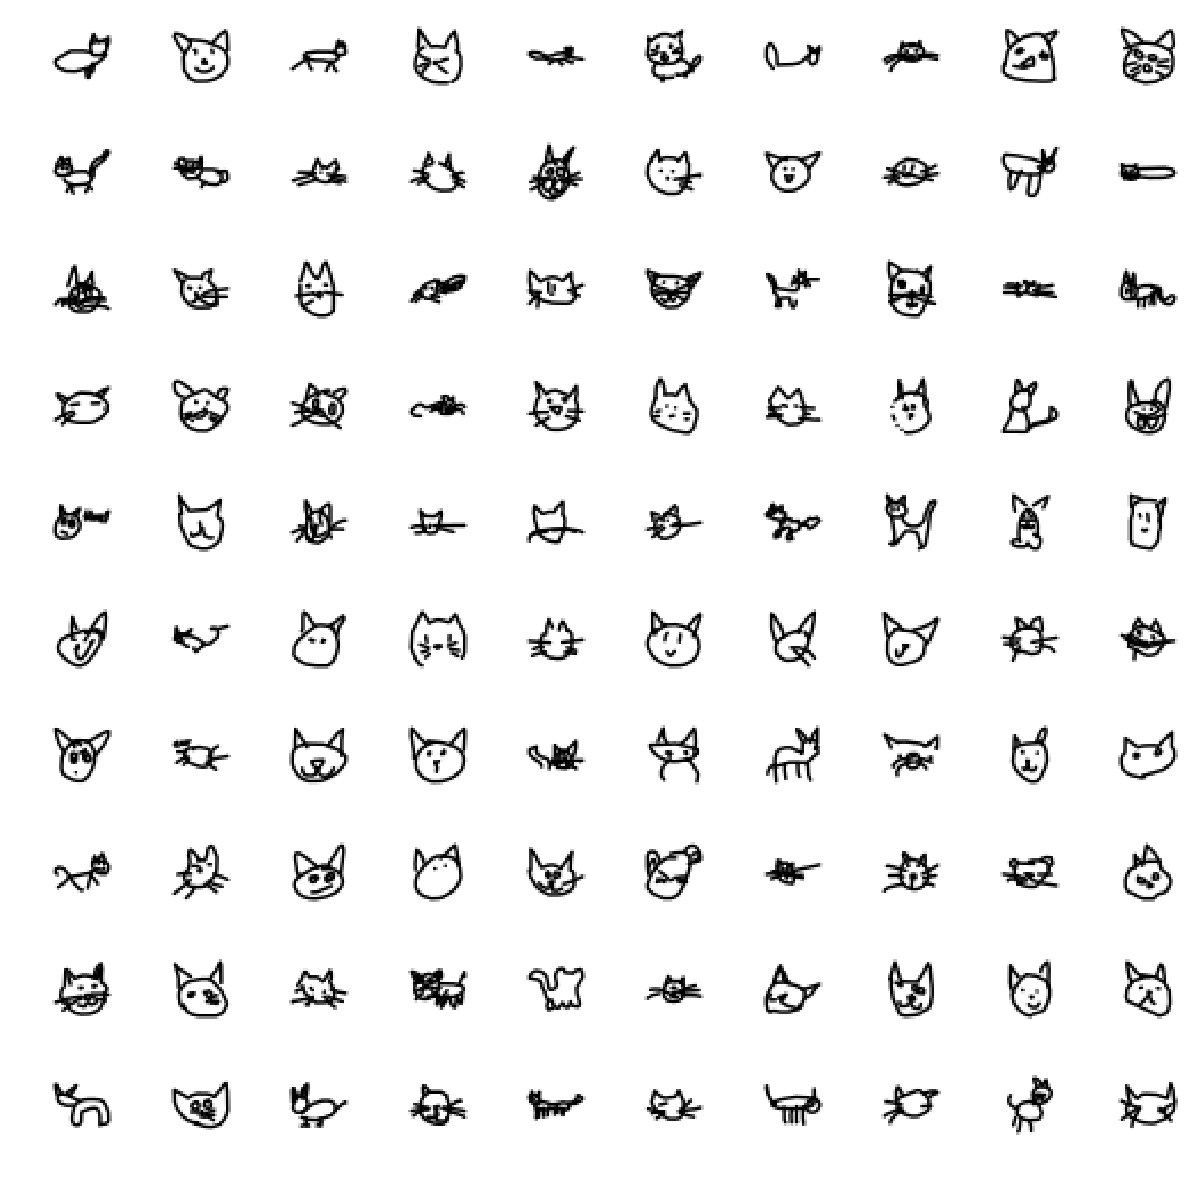 /catgan-cat-face-generation-using-gans-f44663586d6b feature image